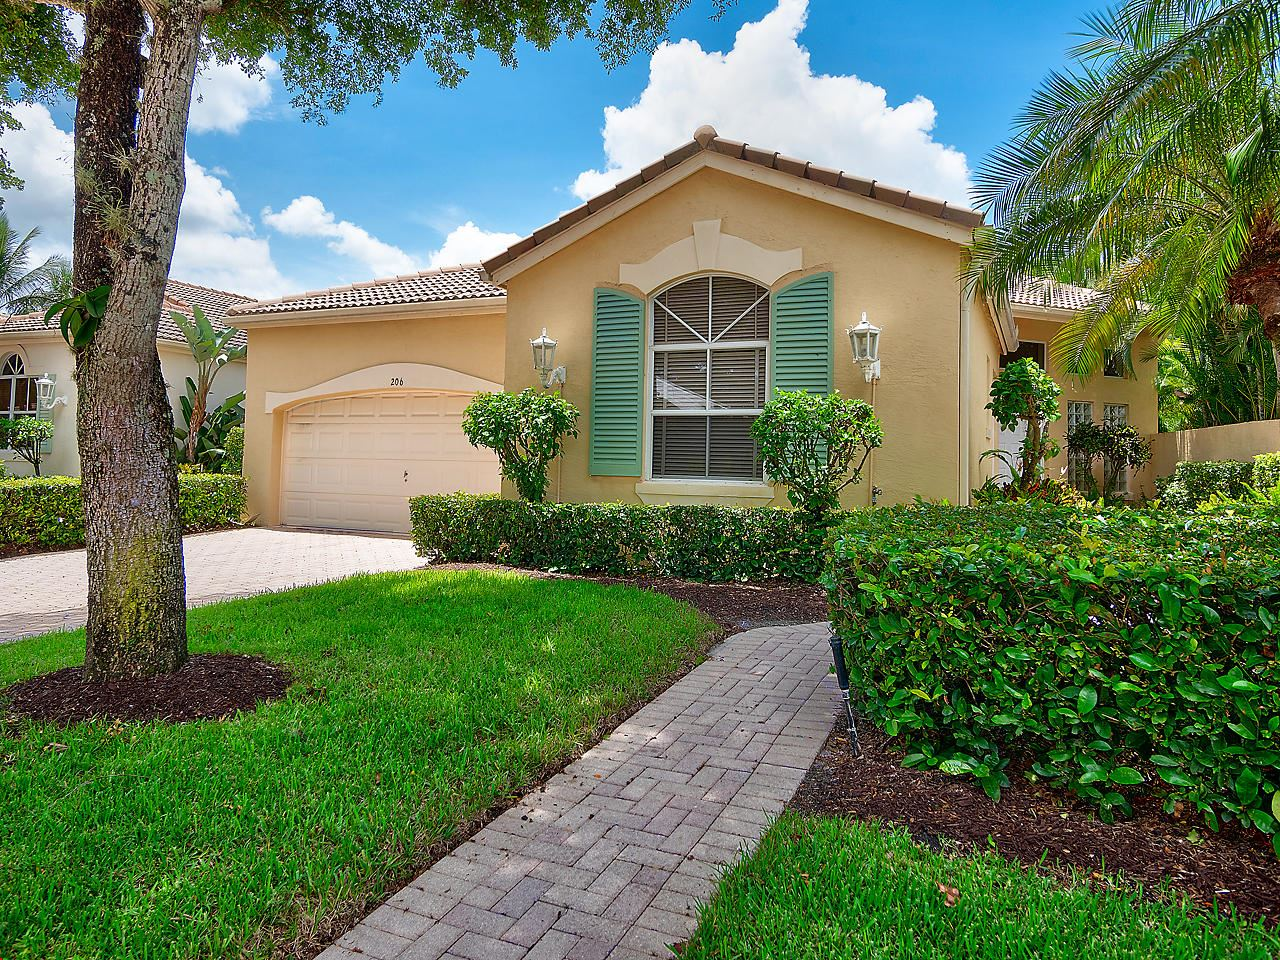 206 Sunset Bay Court, Palm Beach Gardens, FL 33418 - #: RX-10644292